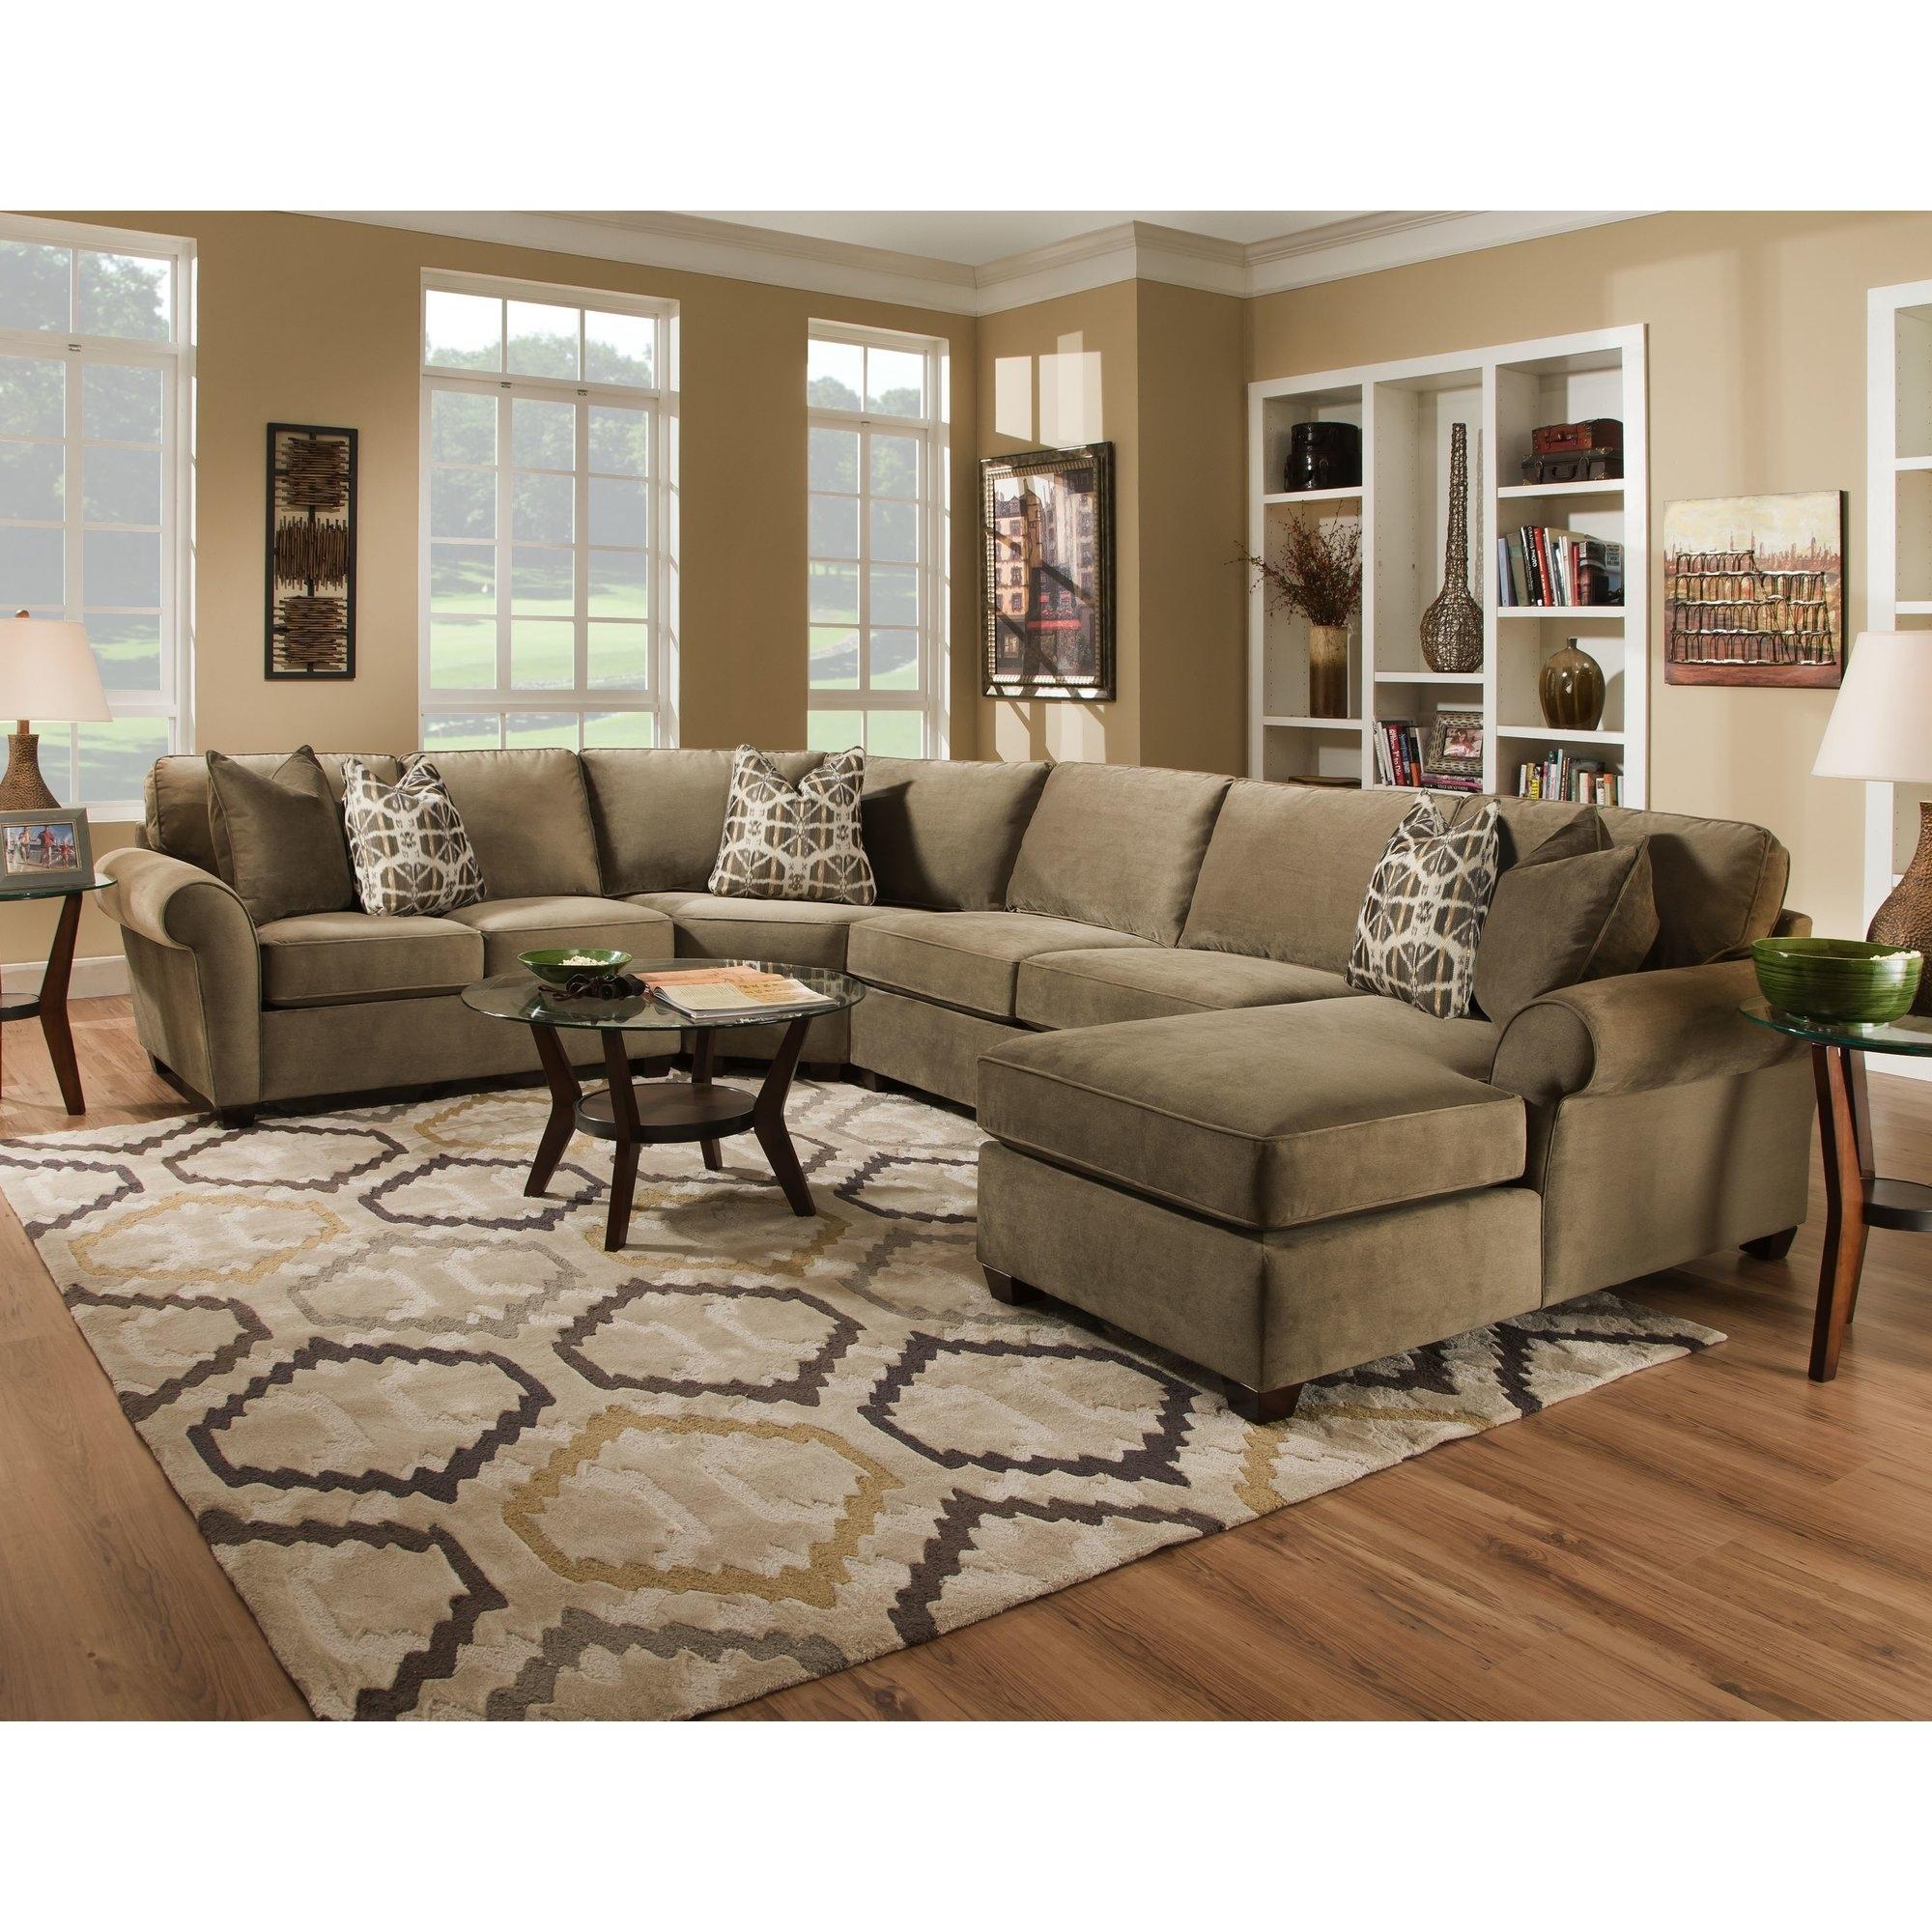 Best Most Comfortable Sectional Sofa   Sofa Design Ideas